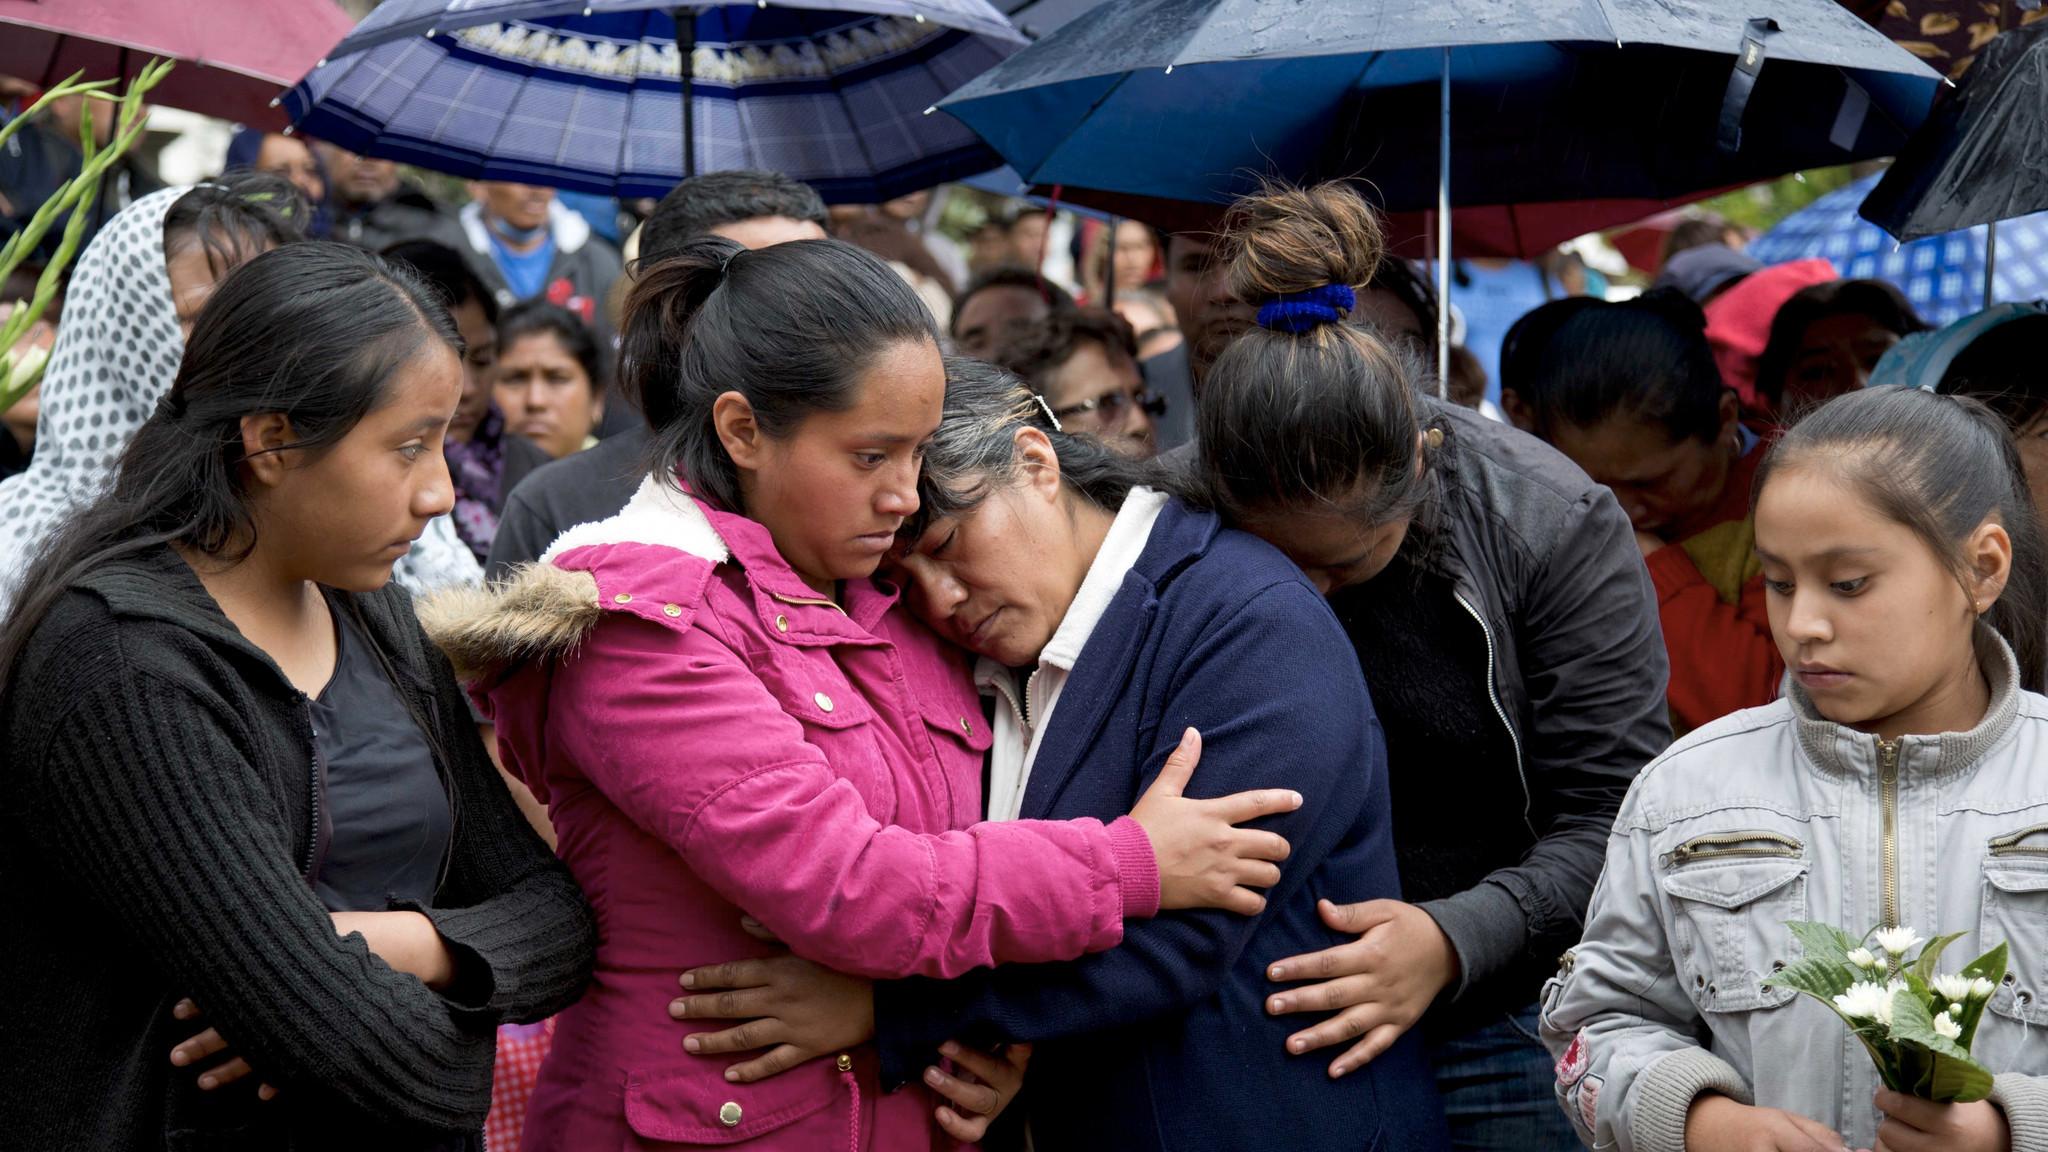 Patricia Sanchez Meza, mother of Jesus Cadena Sanchez is comforted by relatives at his funeral